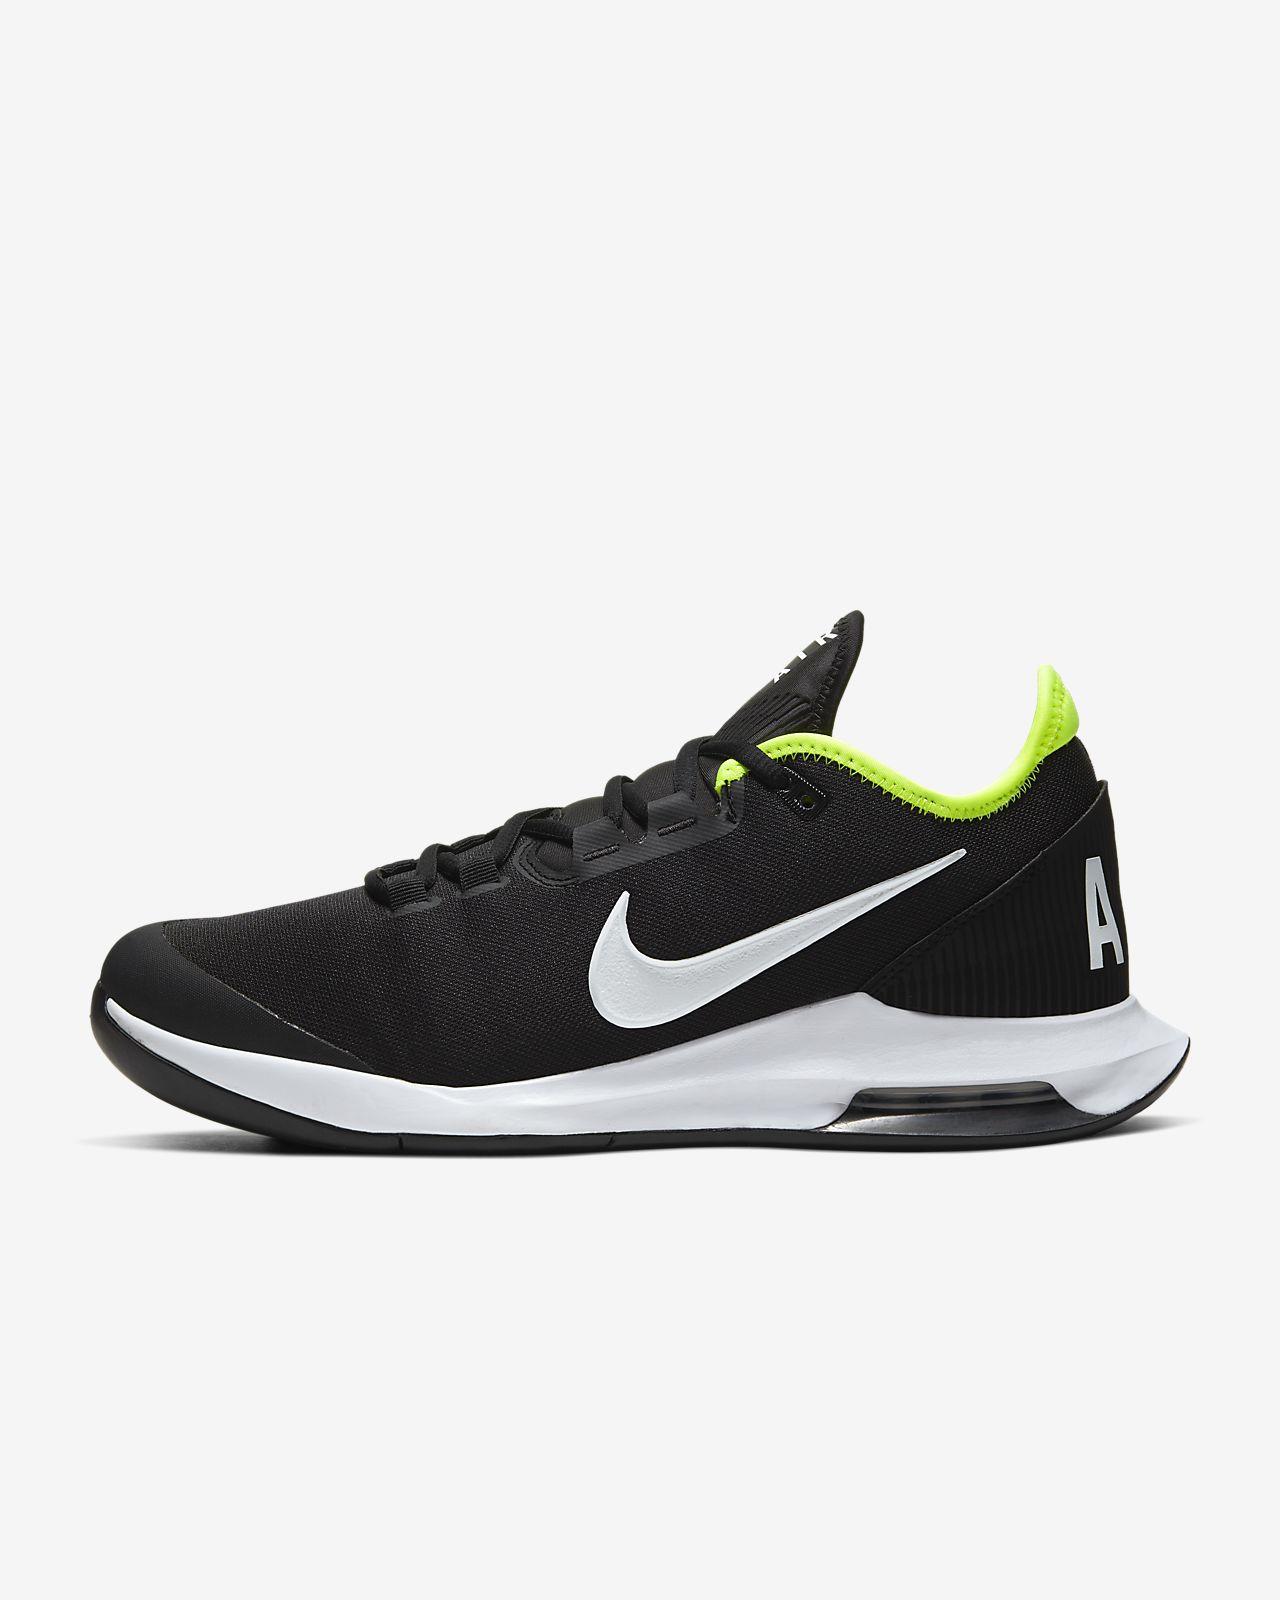 NikeCourt Air Max Wildcard Zapatillas de tenis - Hombre